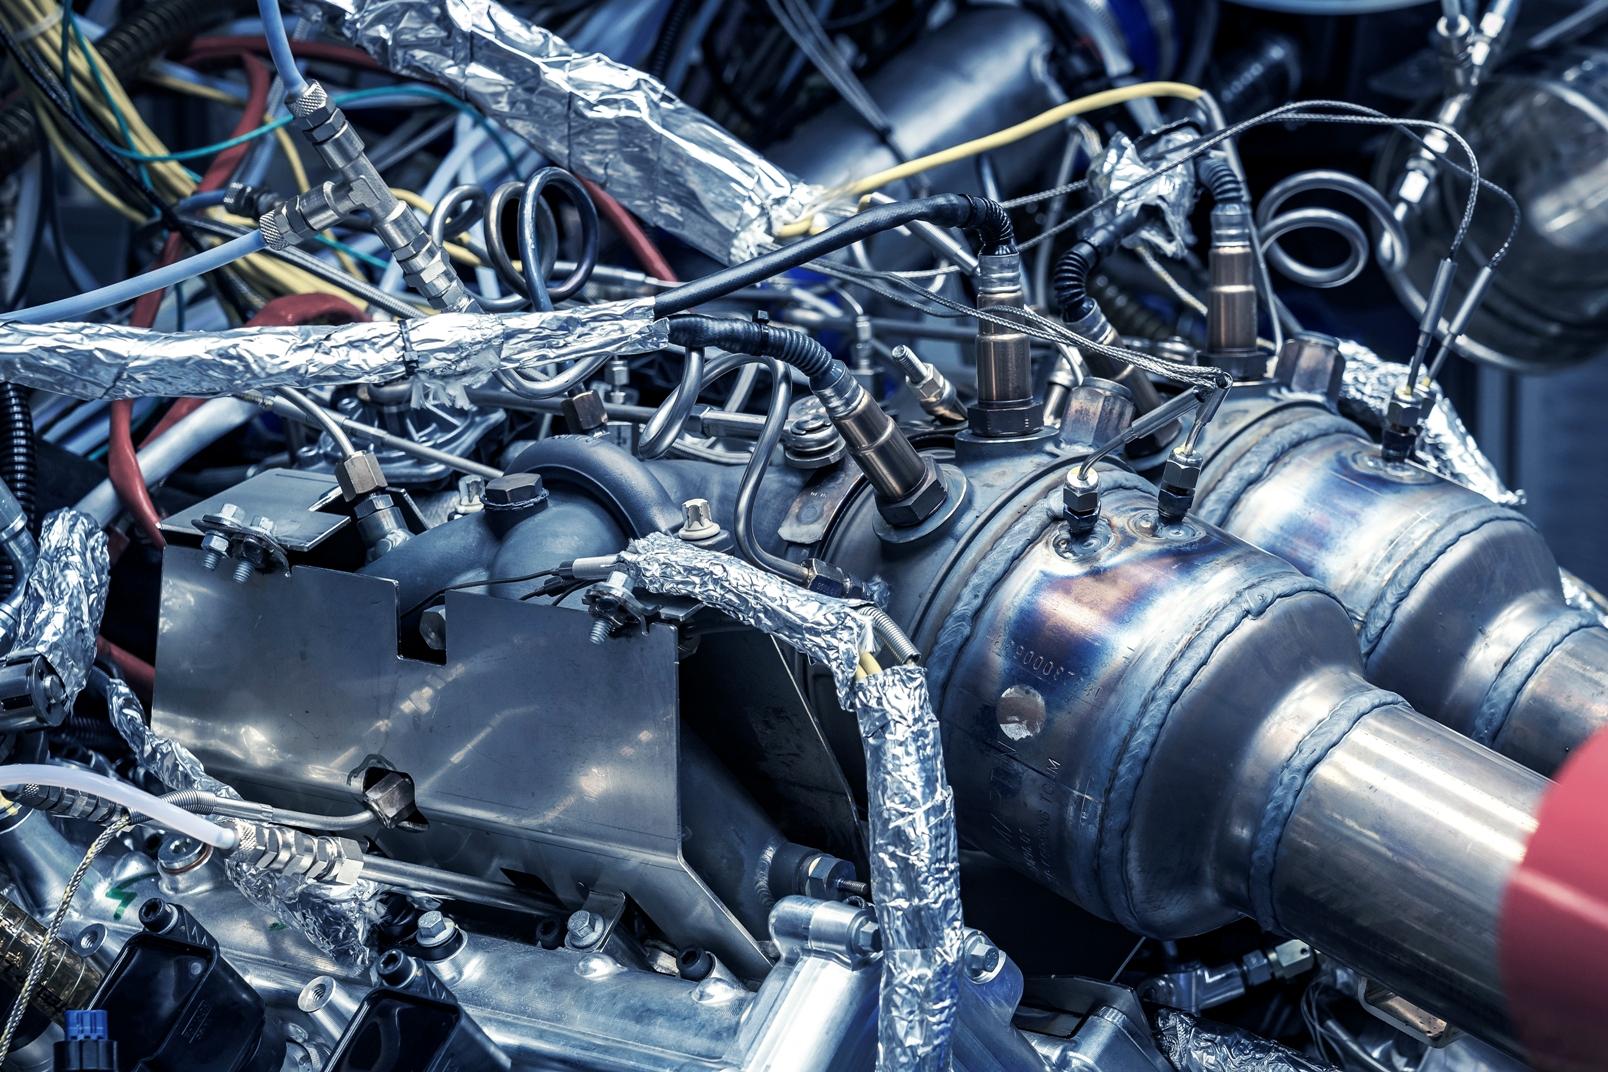 New Aston Martin Engine V6 (5)